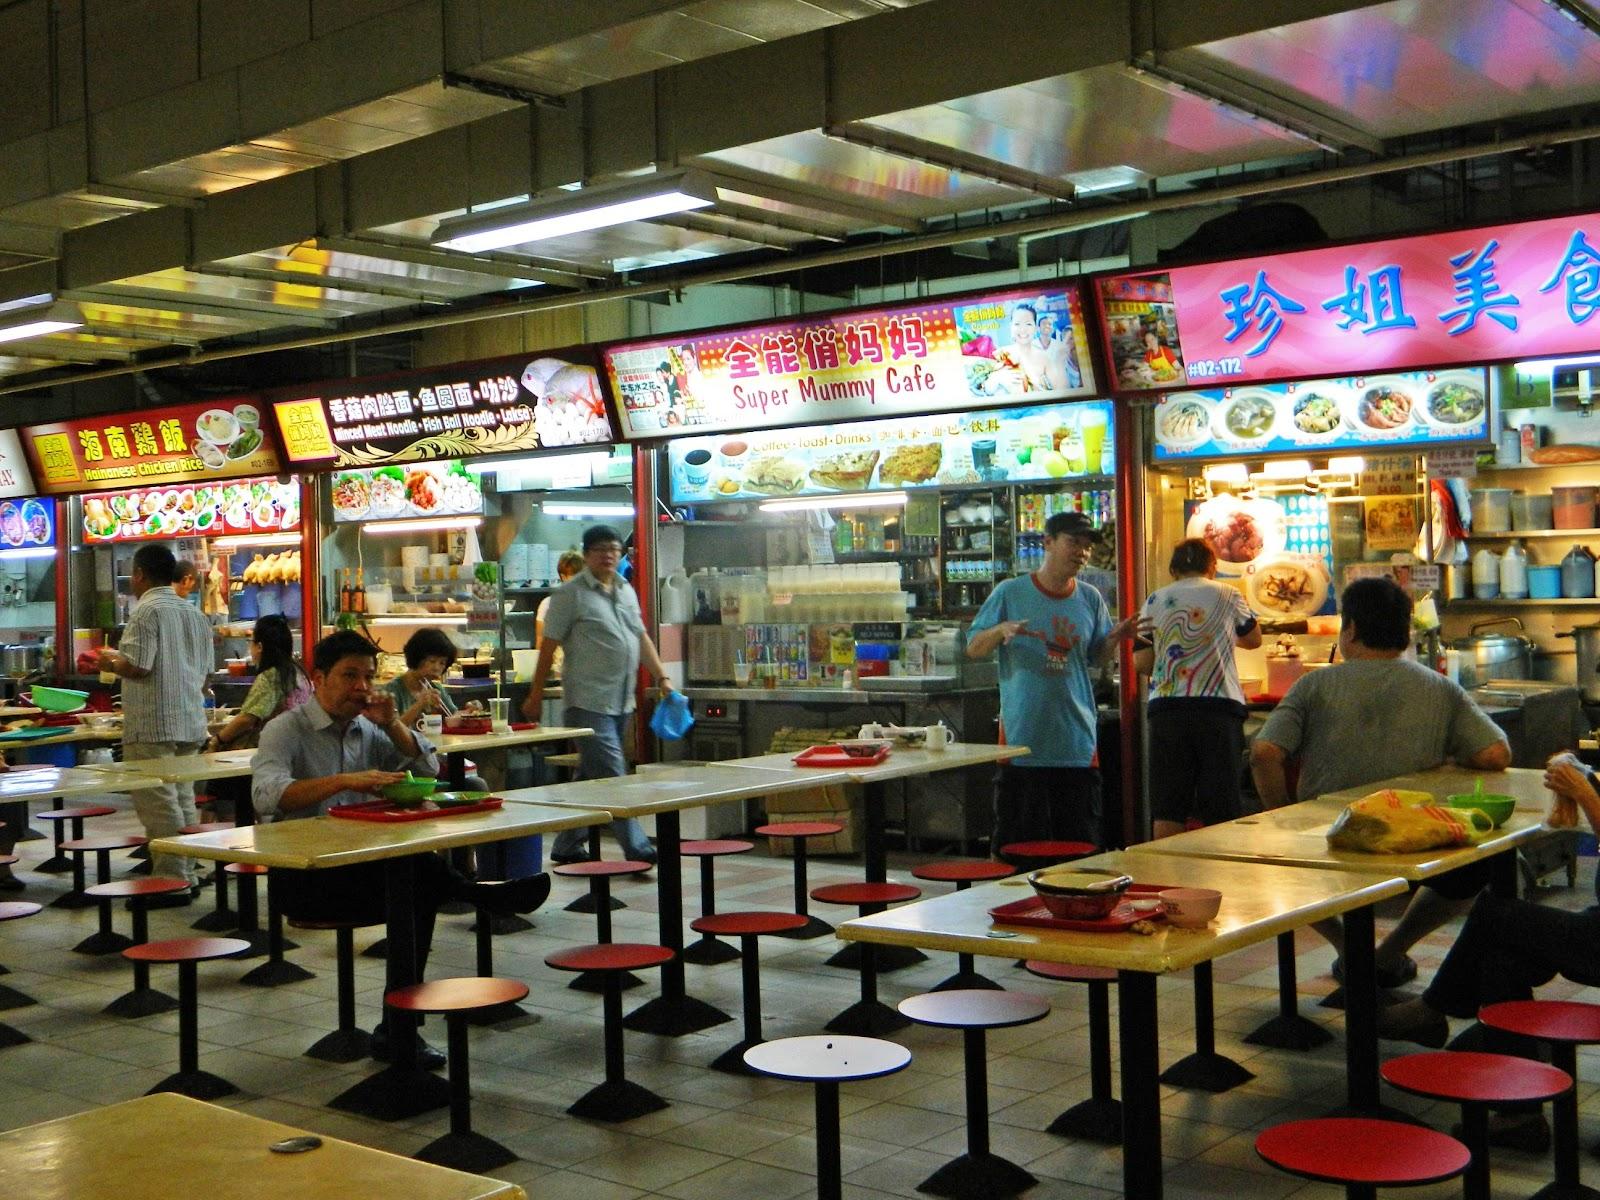 Jax Stumpes: Singapore Chinatown Walk (9/10/2012)